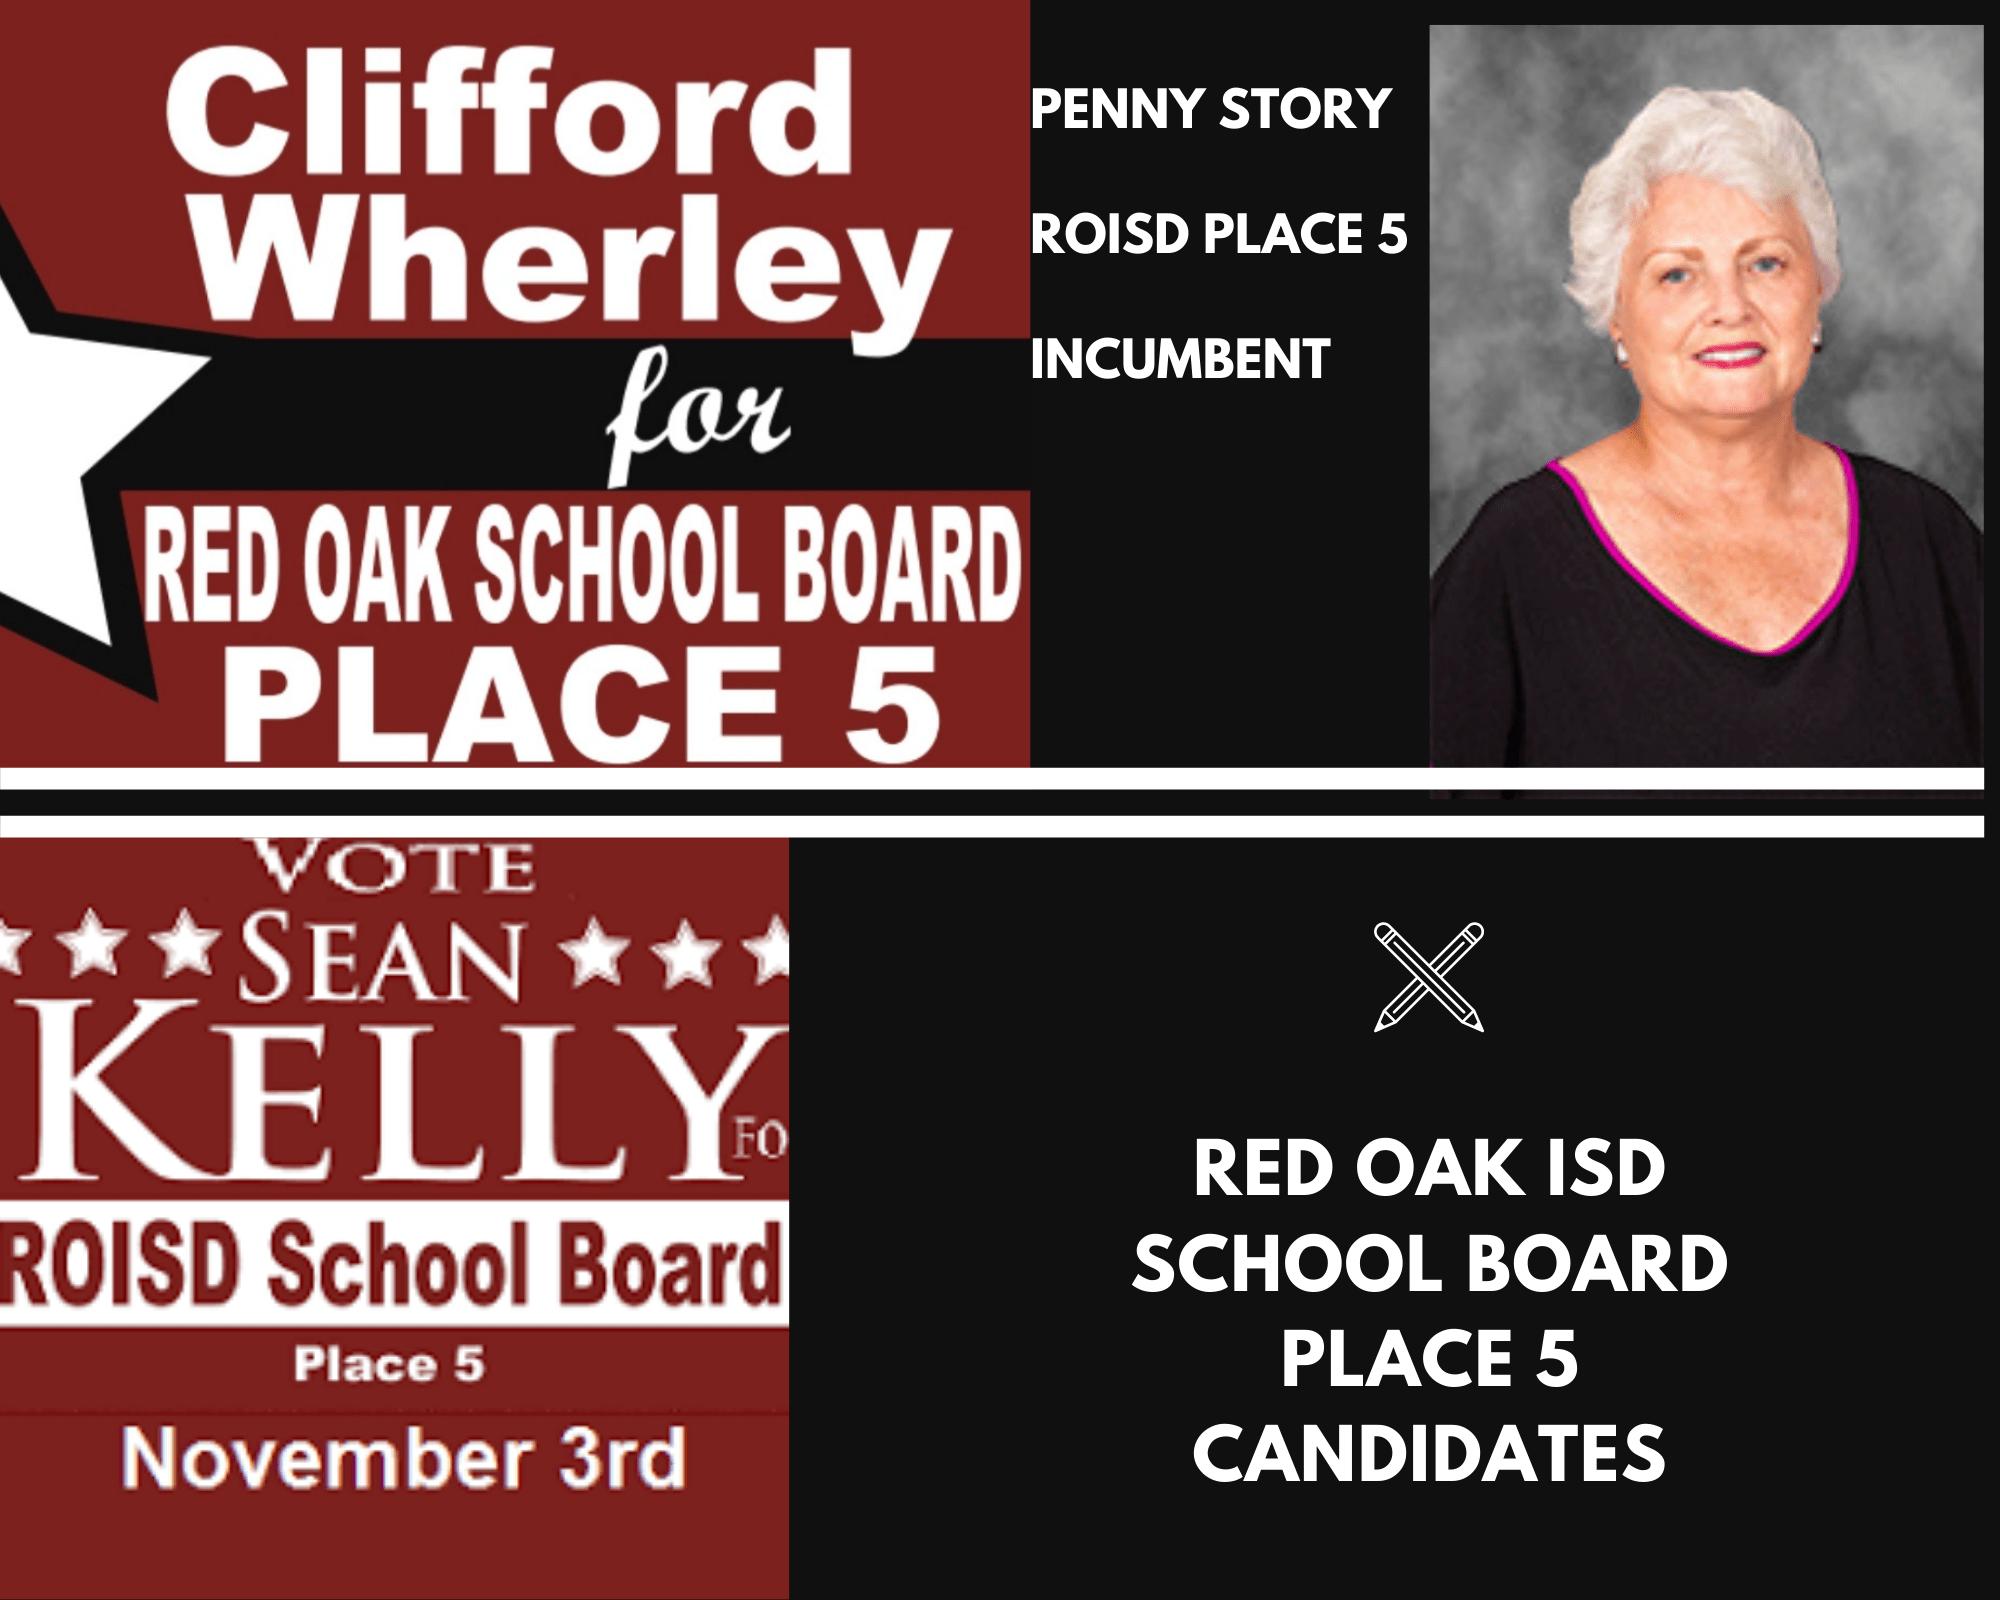 ROISD Place 5 Candidates